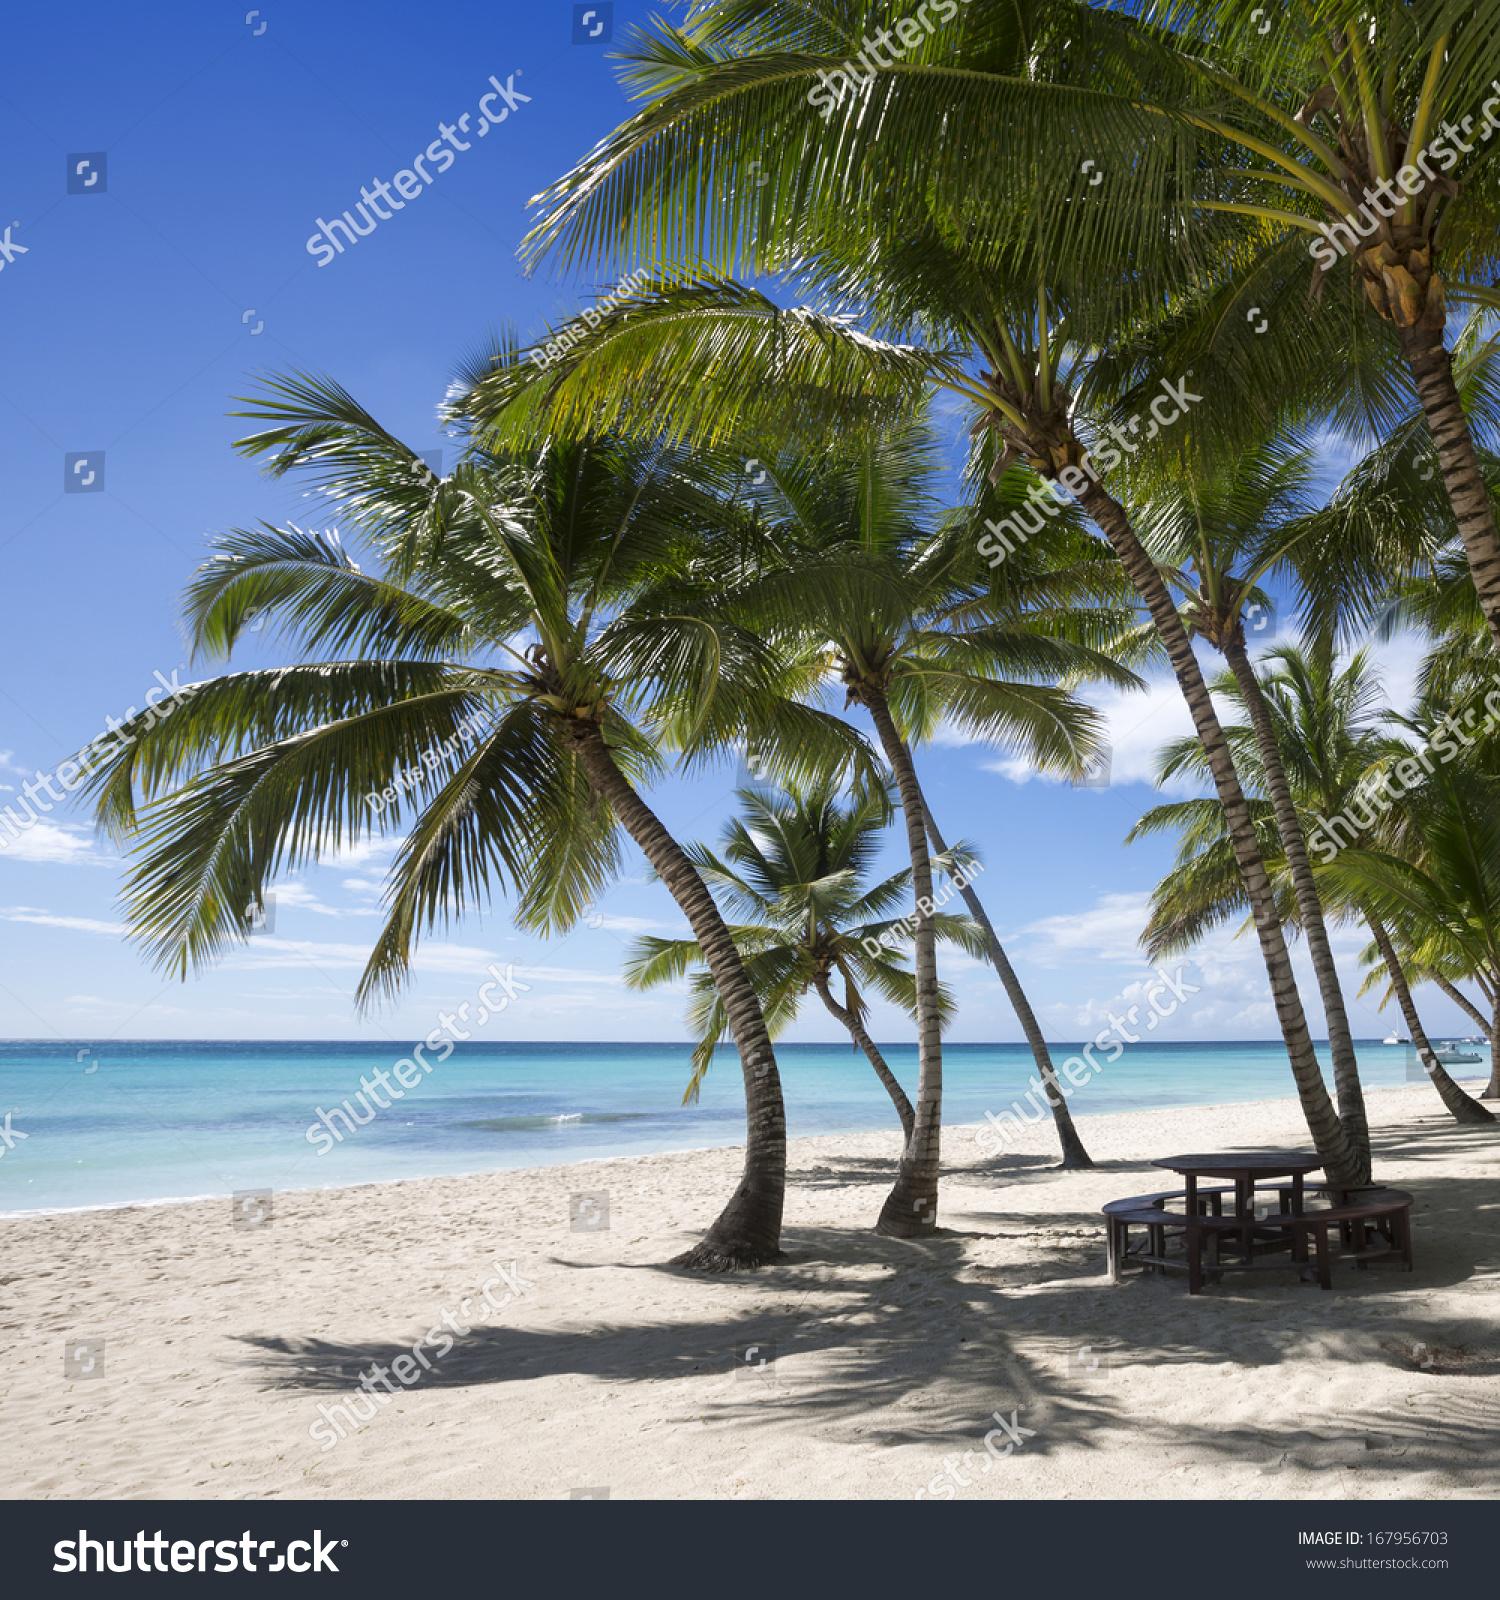 Tropical Island Beaches: Beach On Tropical Island Clear Blue Stock Photo 167956703